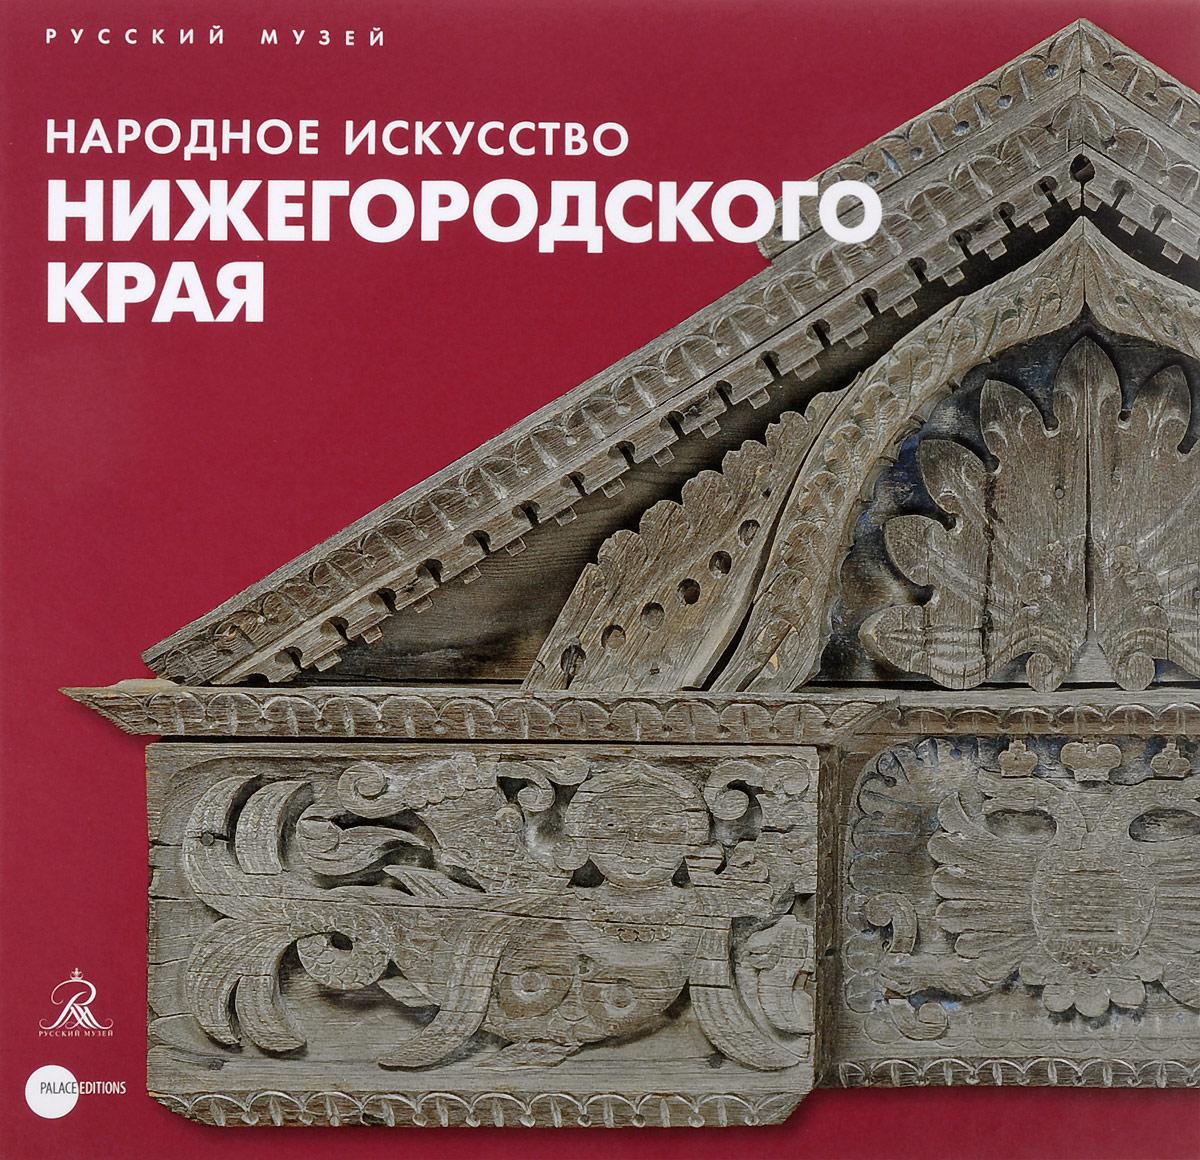 Zakazat.ru: Народное искусство Нижегородского края